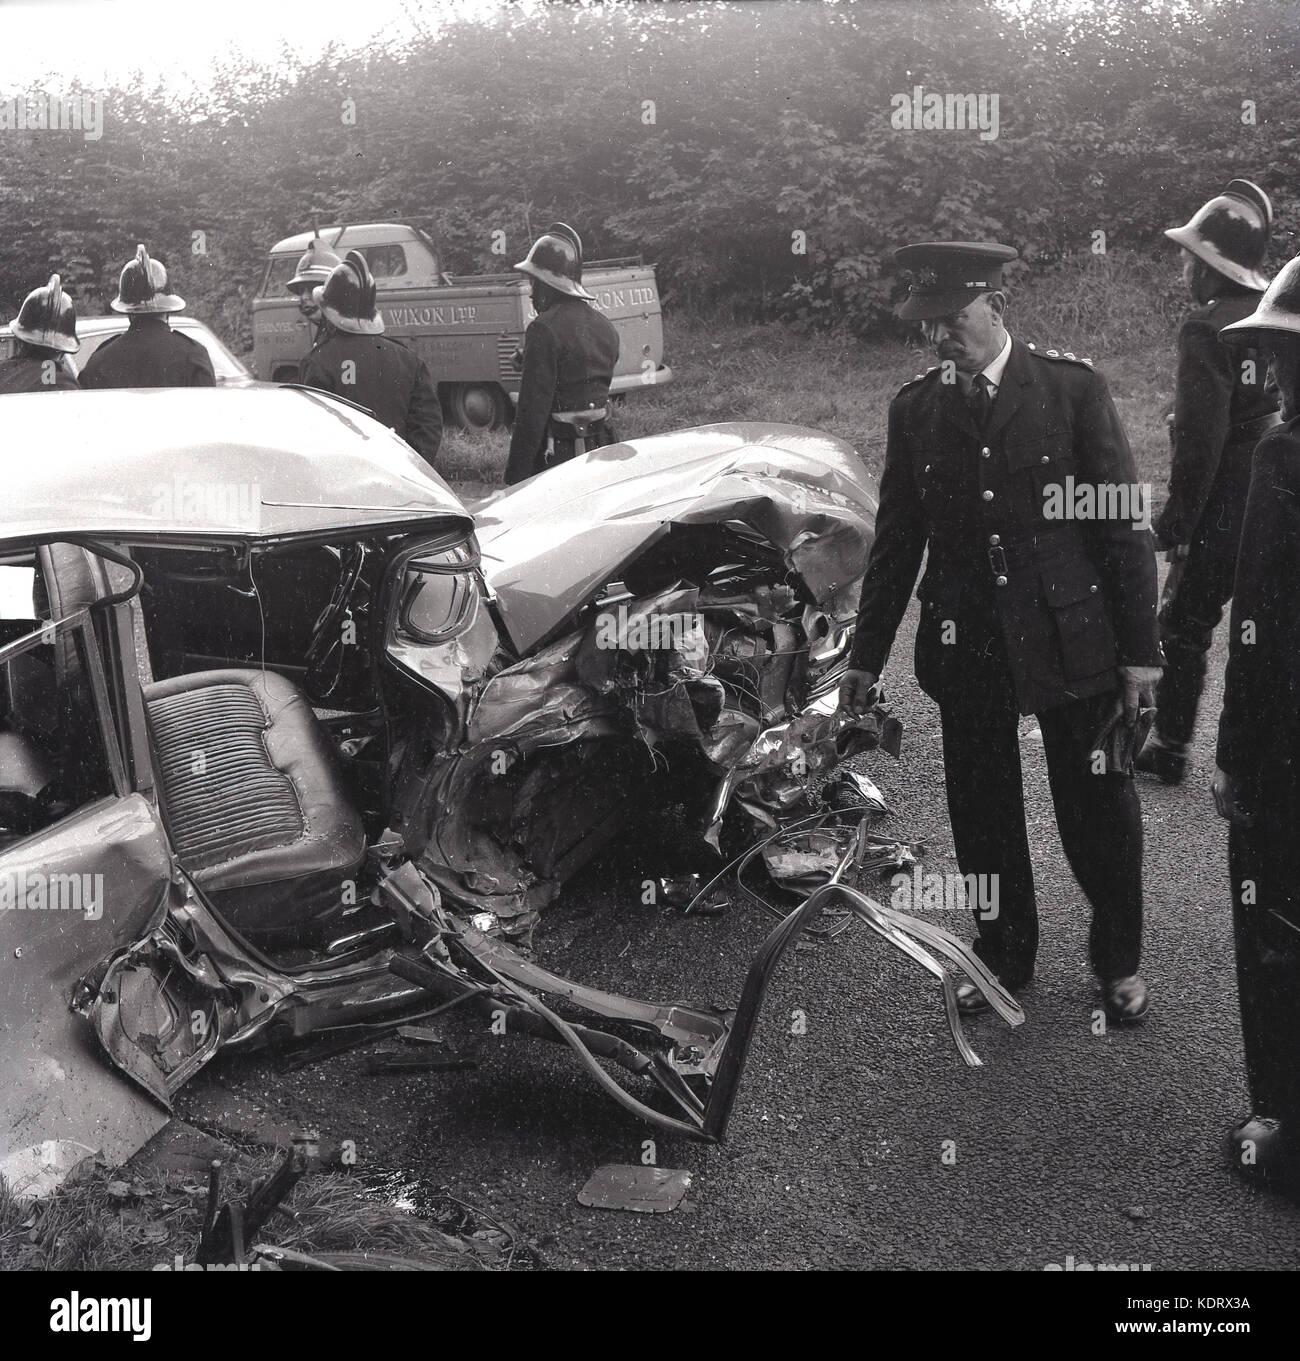 1960s British Police Car Stock Photos & 1960s British